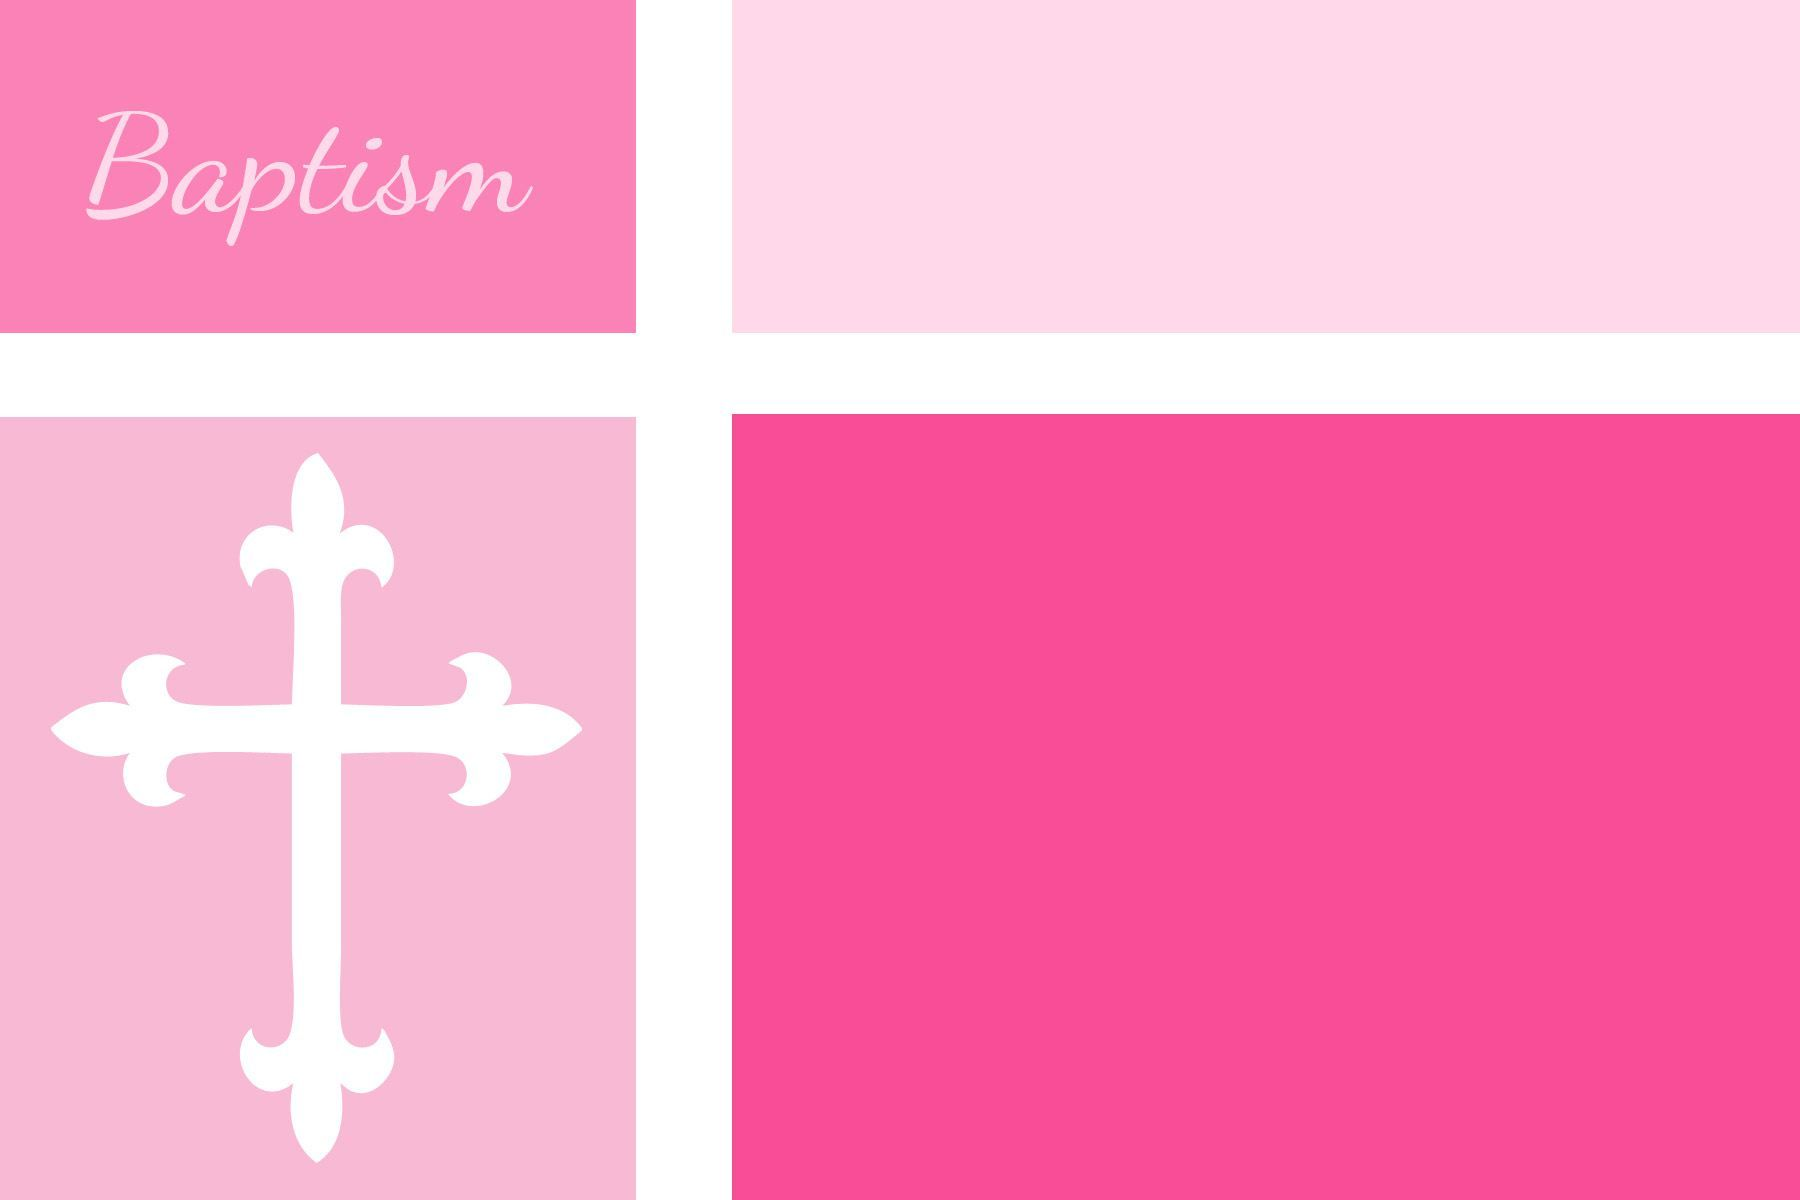 freebaptisminvitationmakersoftware ALEYAH JIREH Pinterest